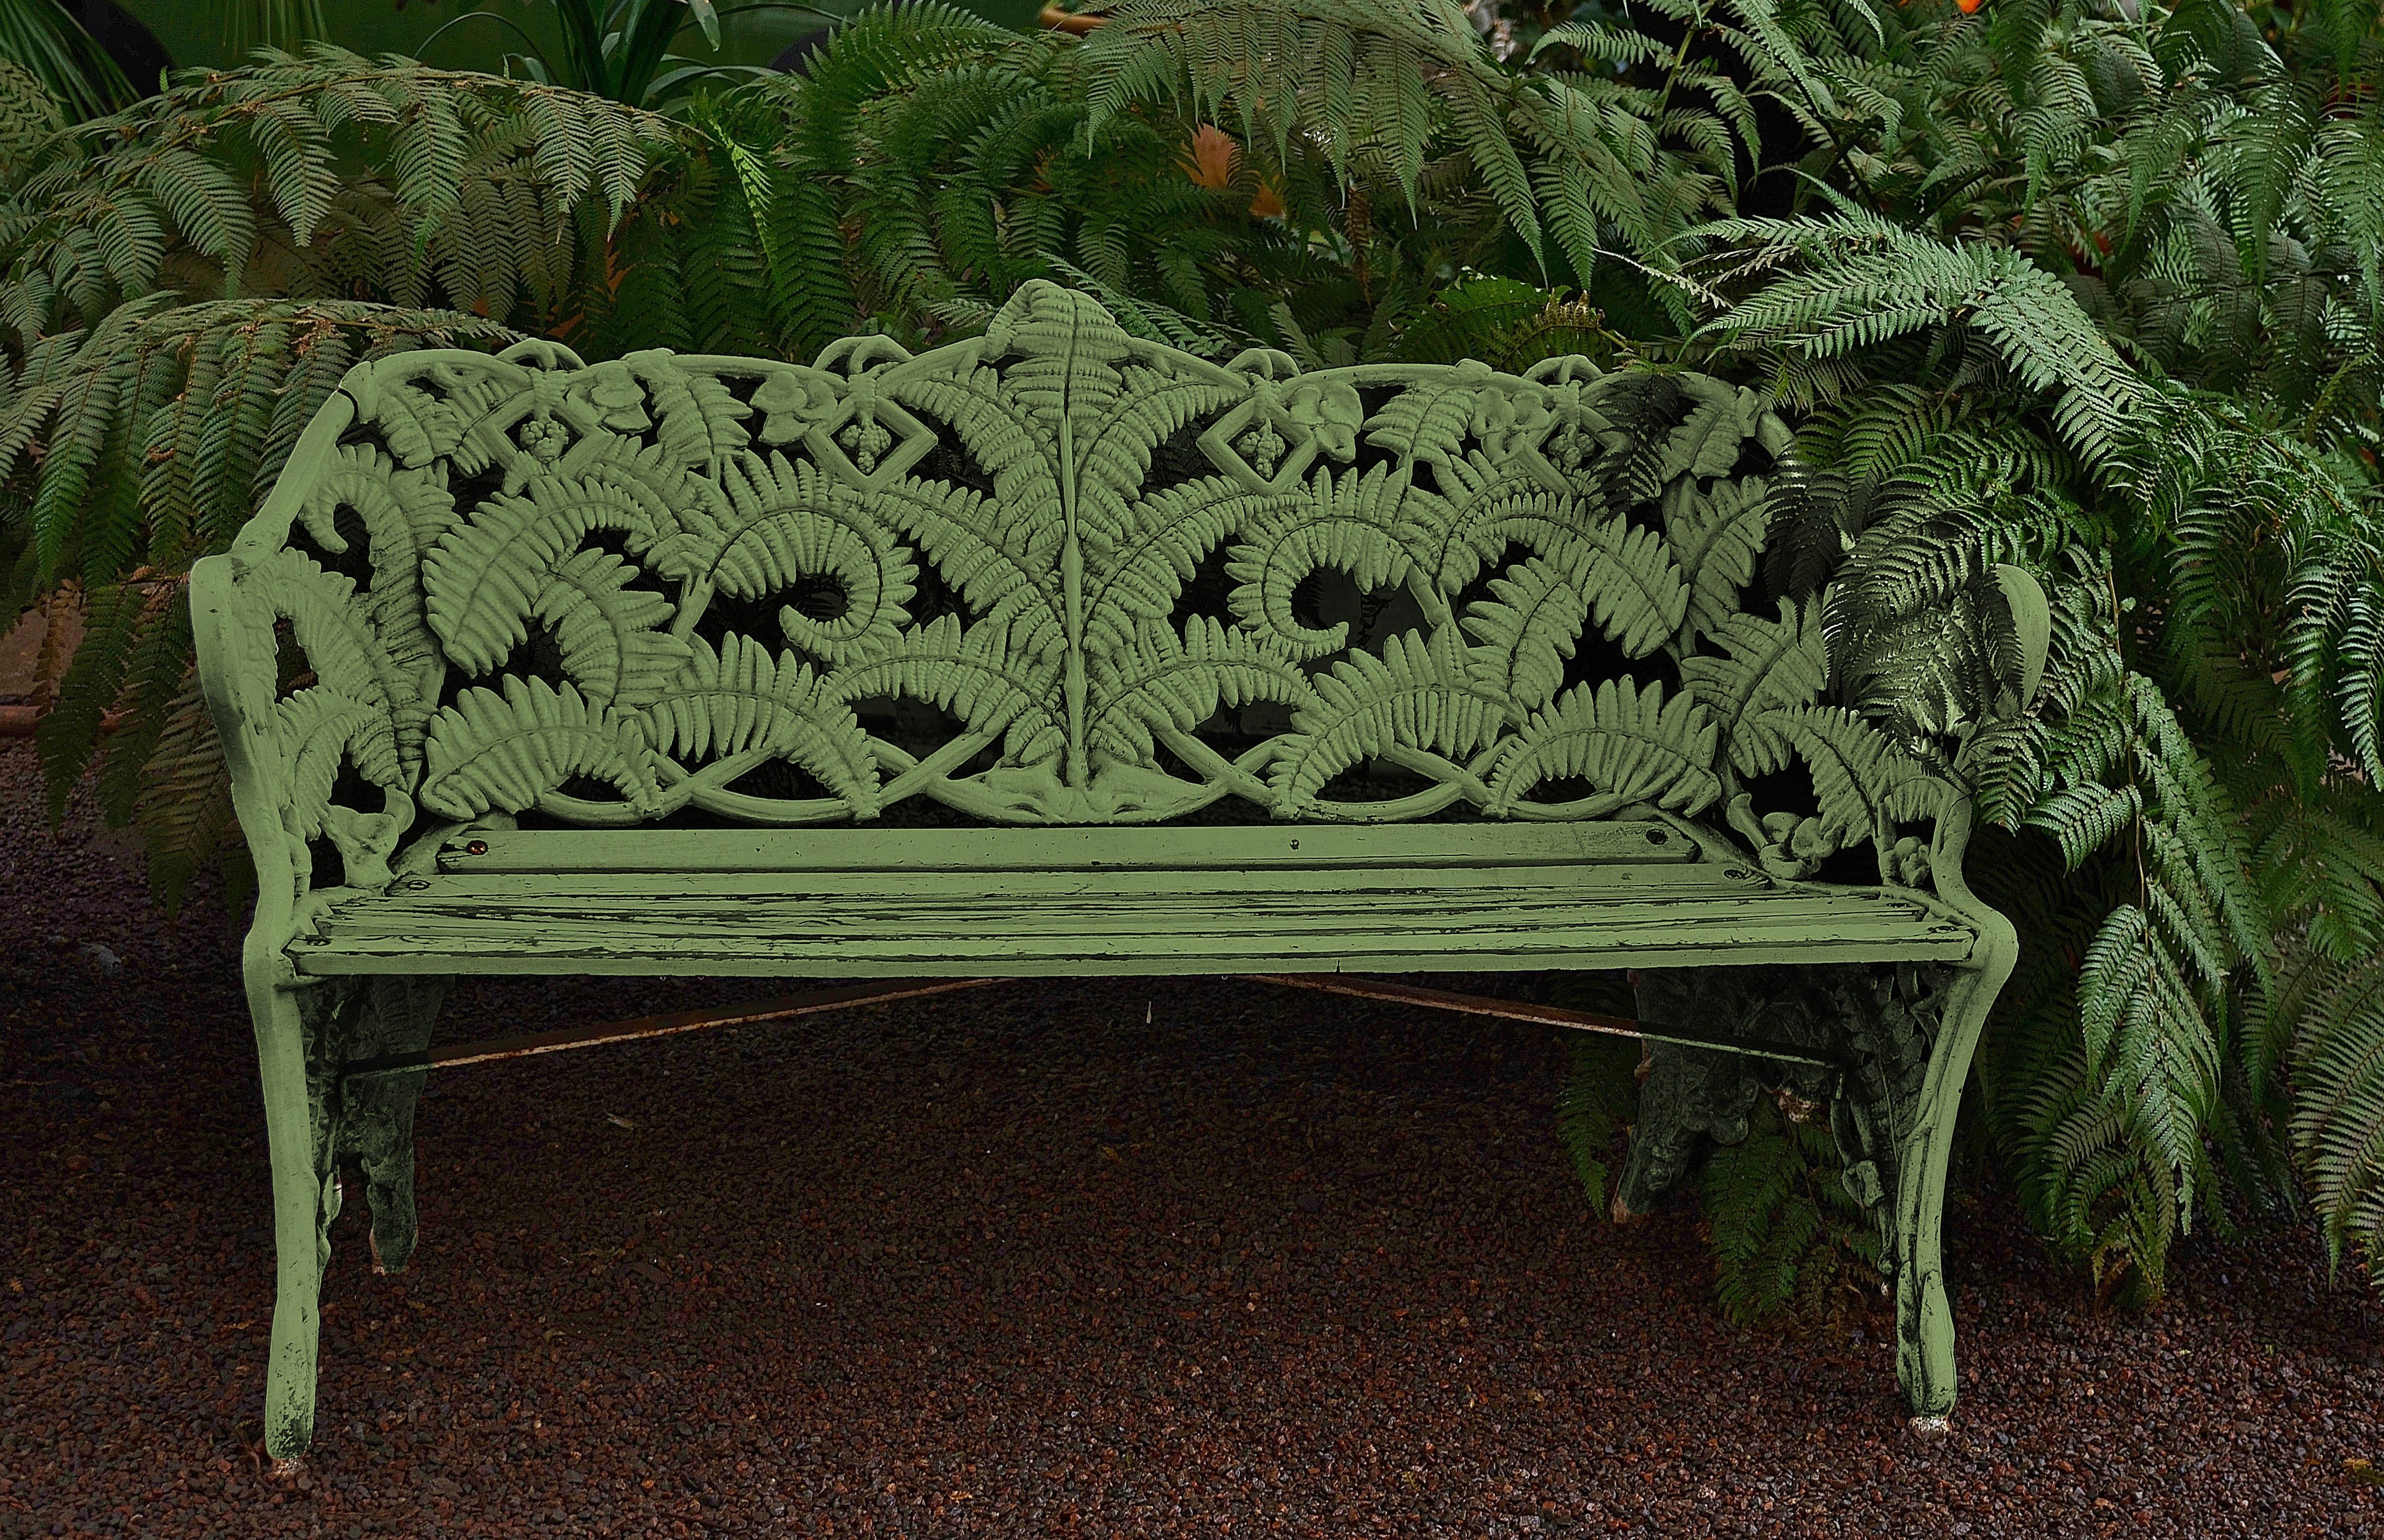 Fotos gratis : naturaleza, banco, silla, asiento, verde, relajarse ...